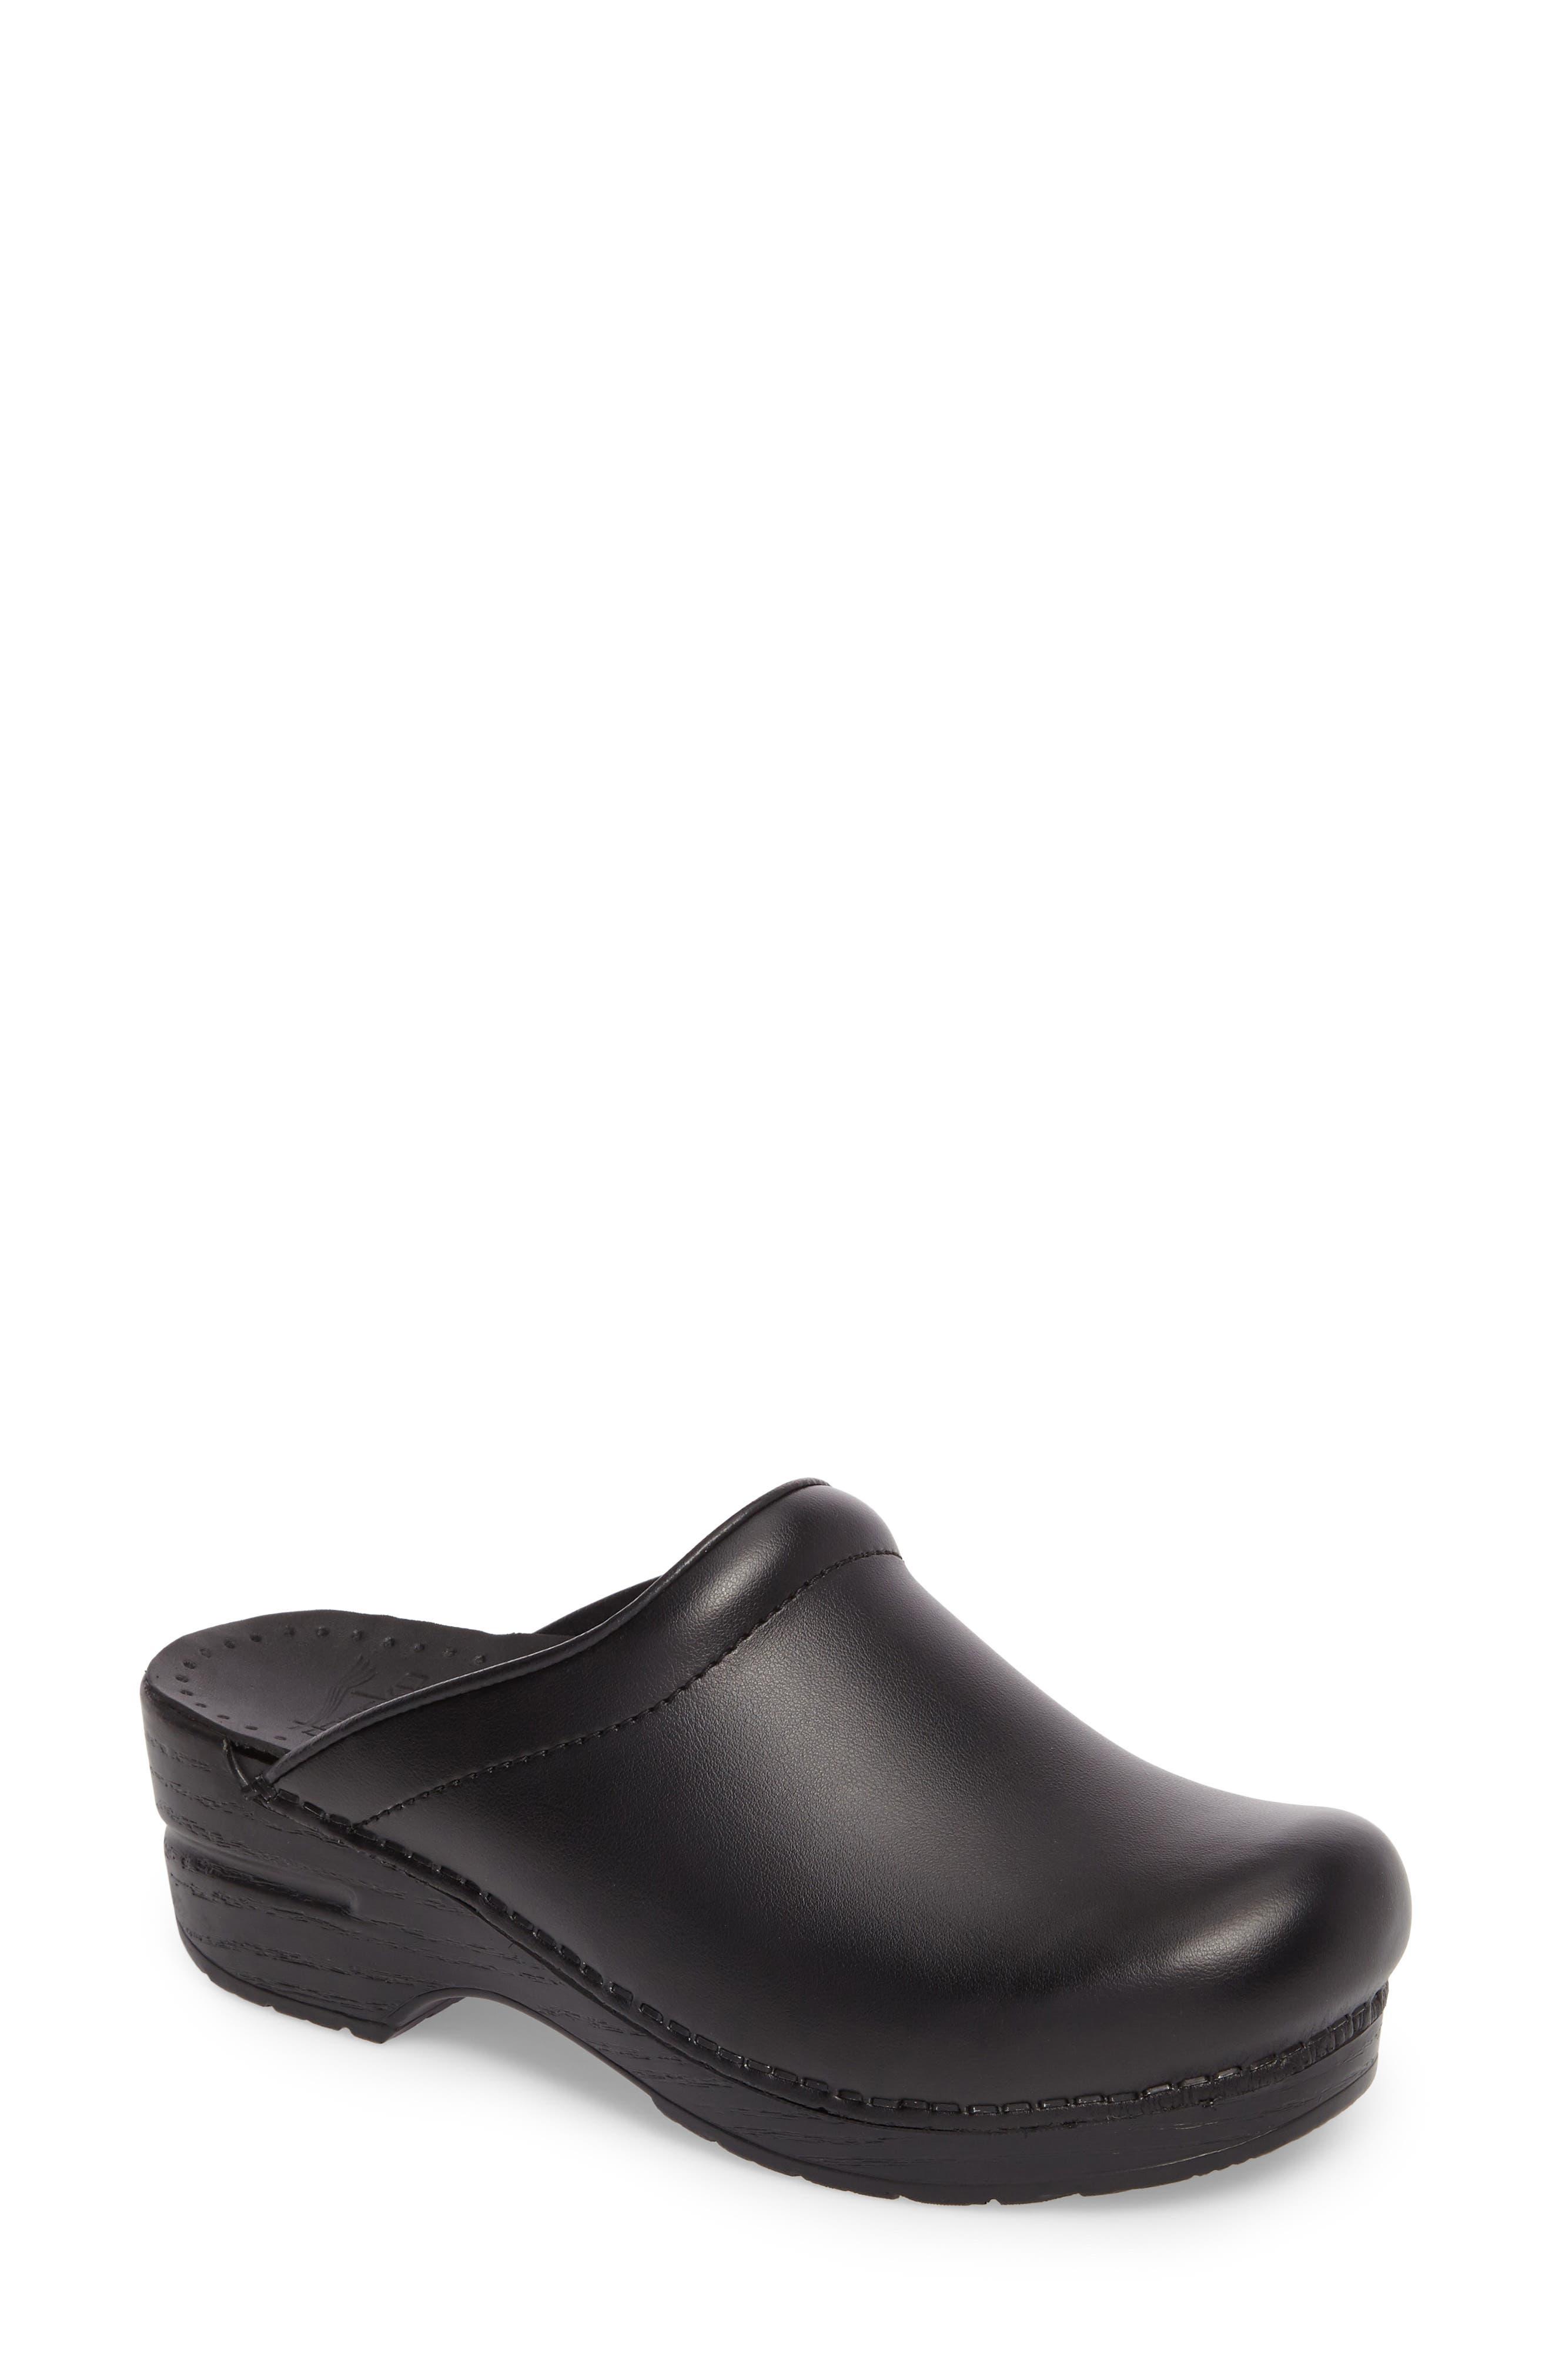 Main Image - Dansko 'Sonja' Patent Leather Clog